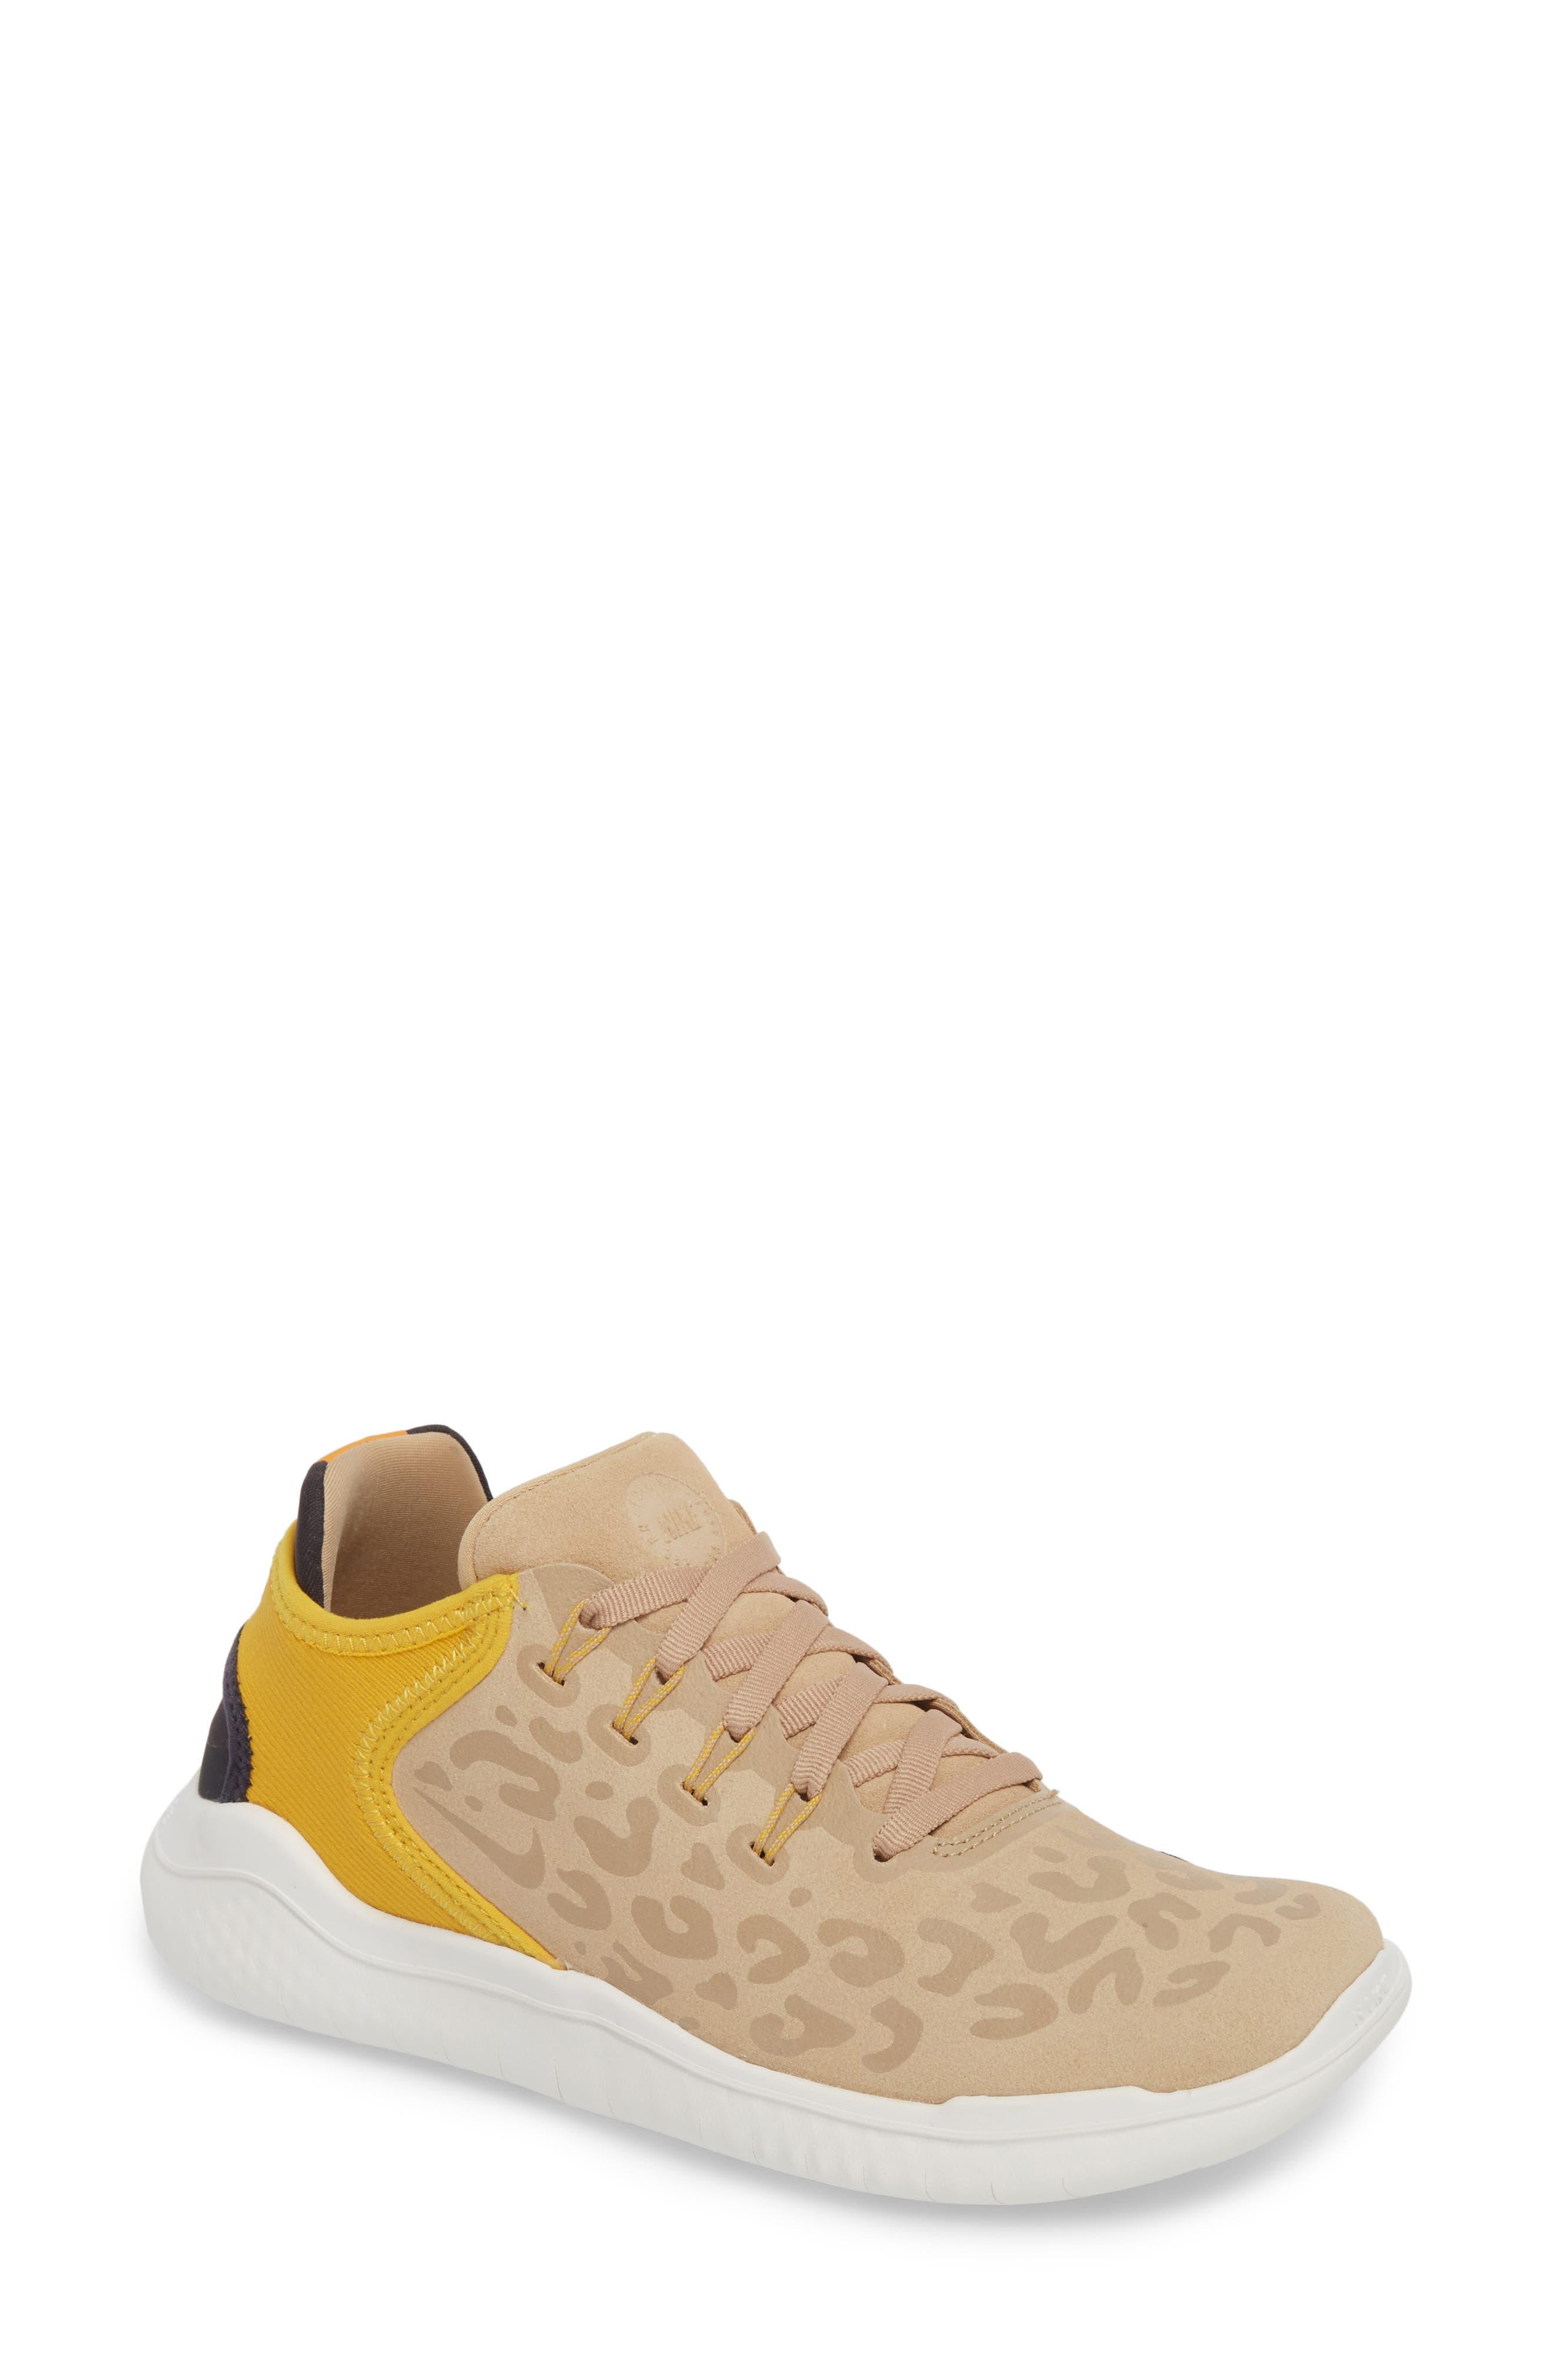 Nike Free RN 2018 Wild Running Shoe (Women)